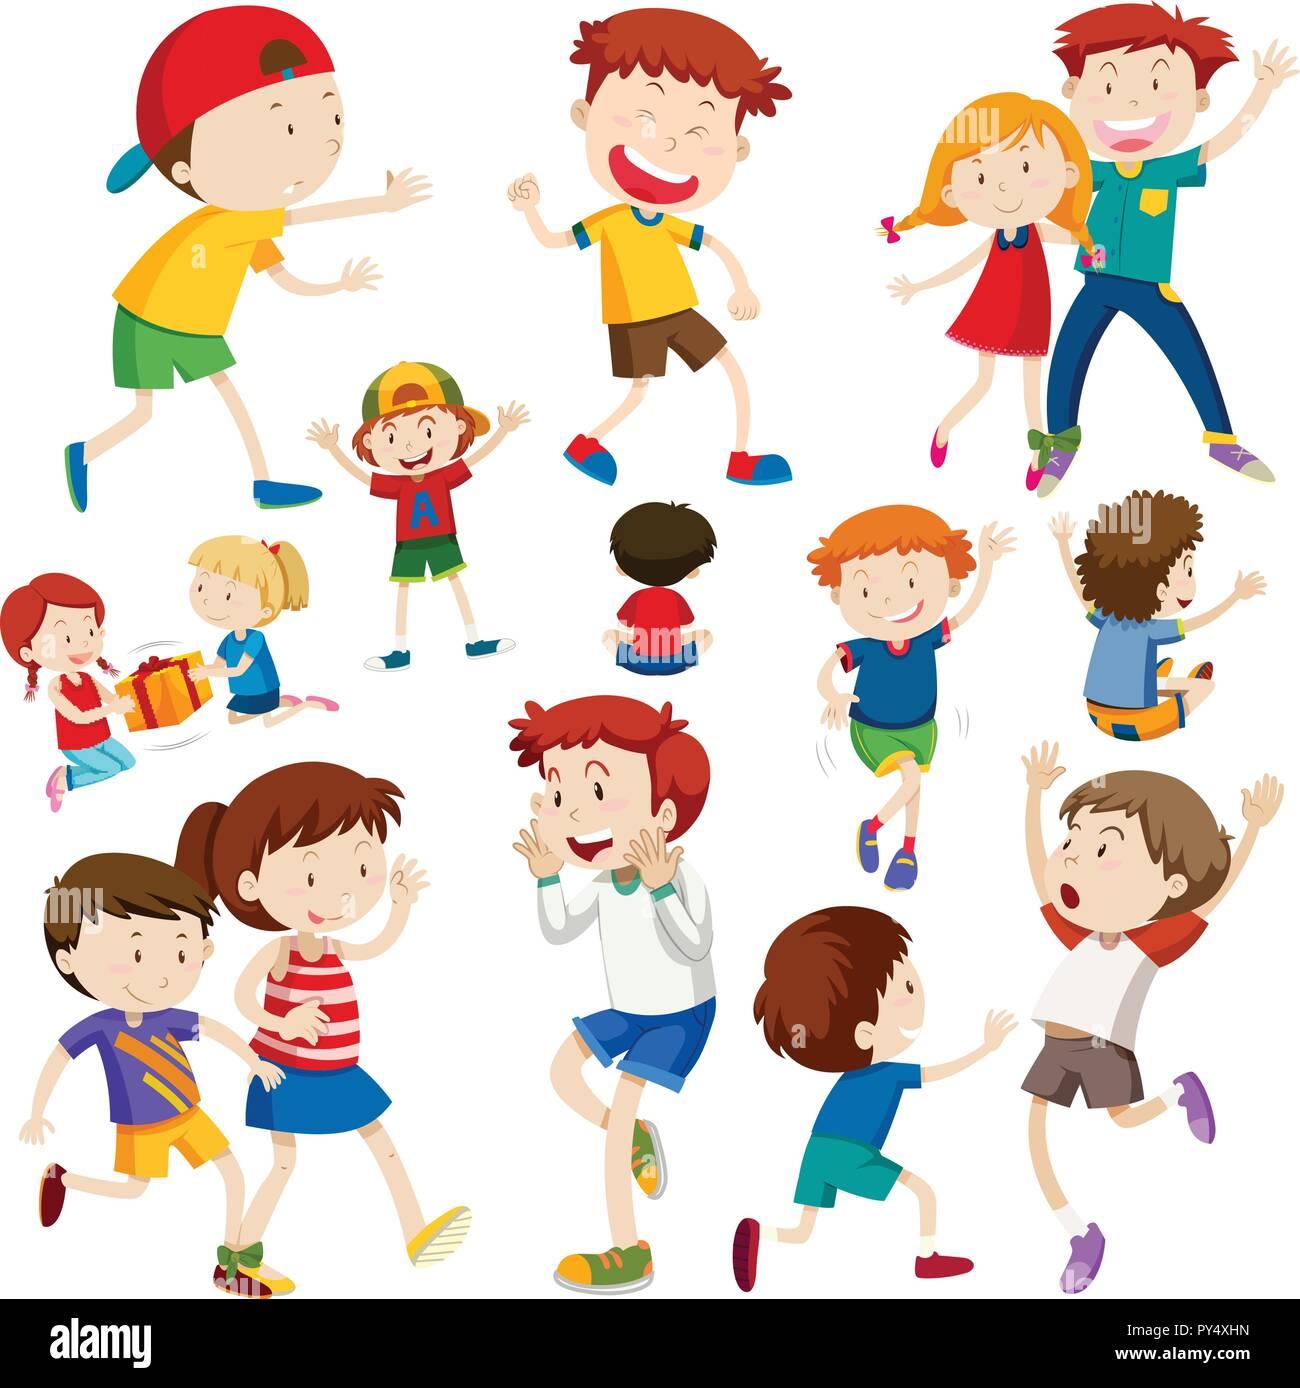 Set of happy children illustration - Stock Vector